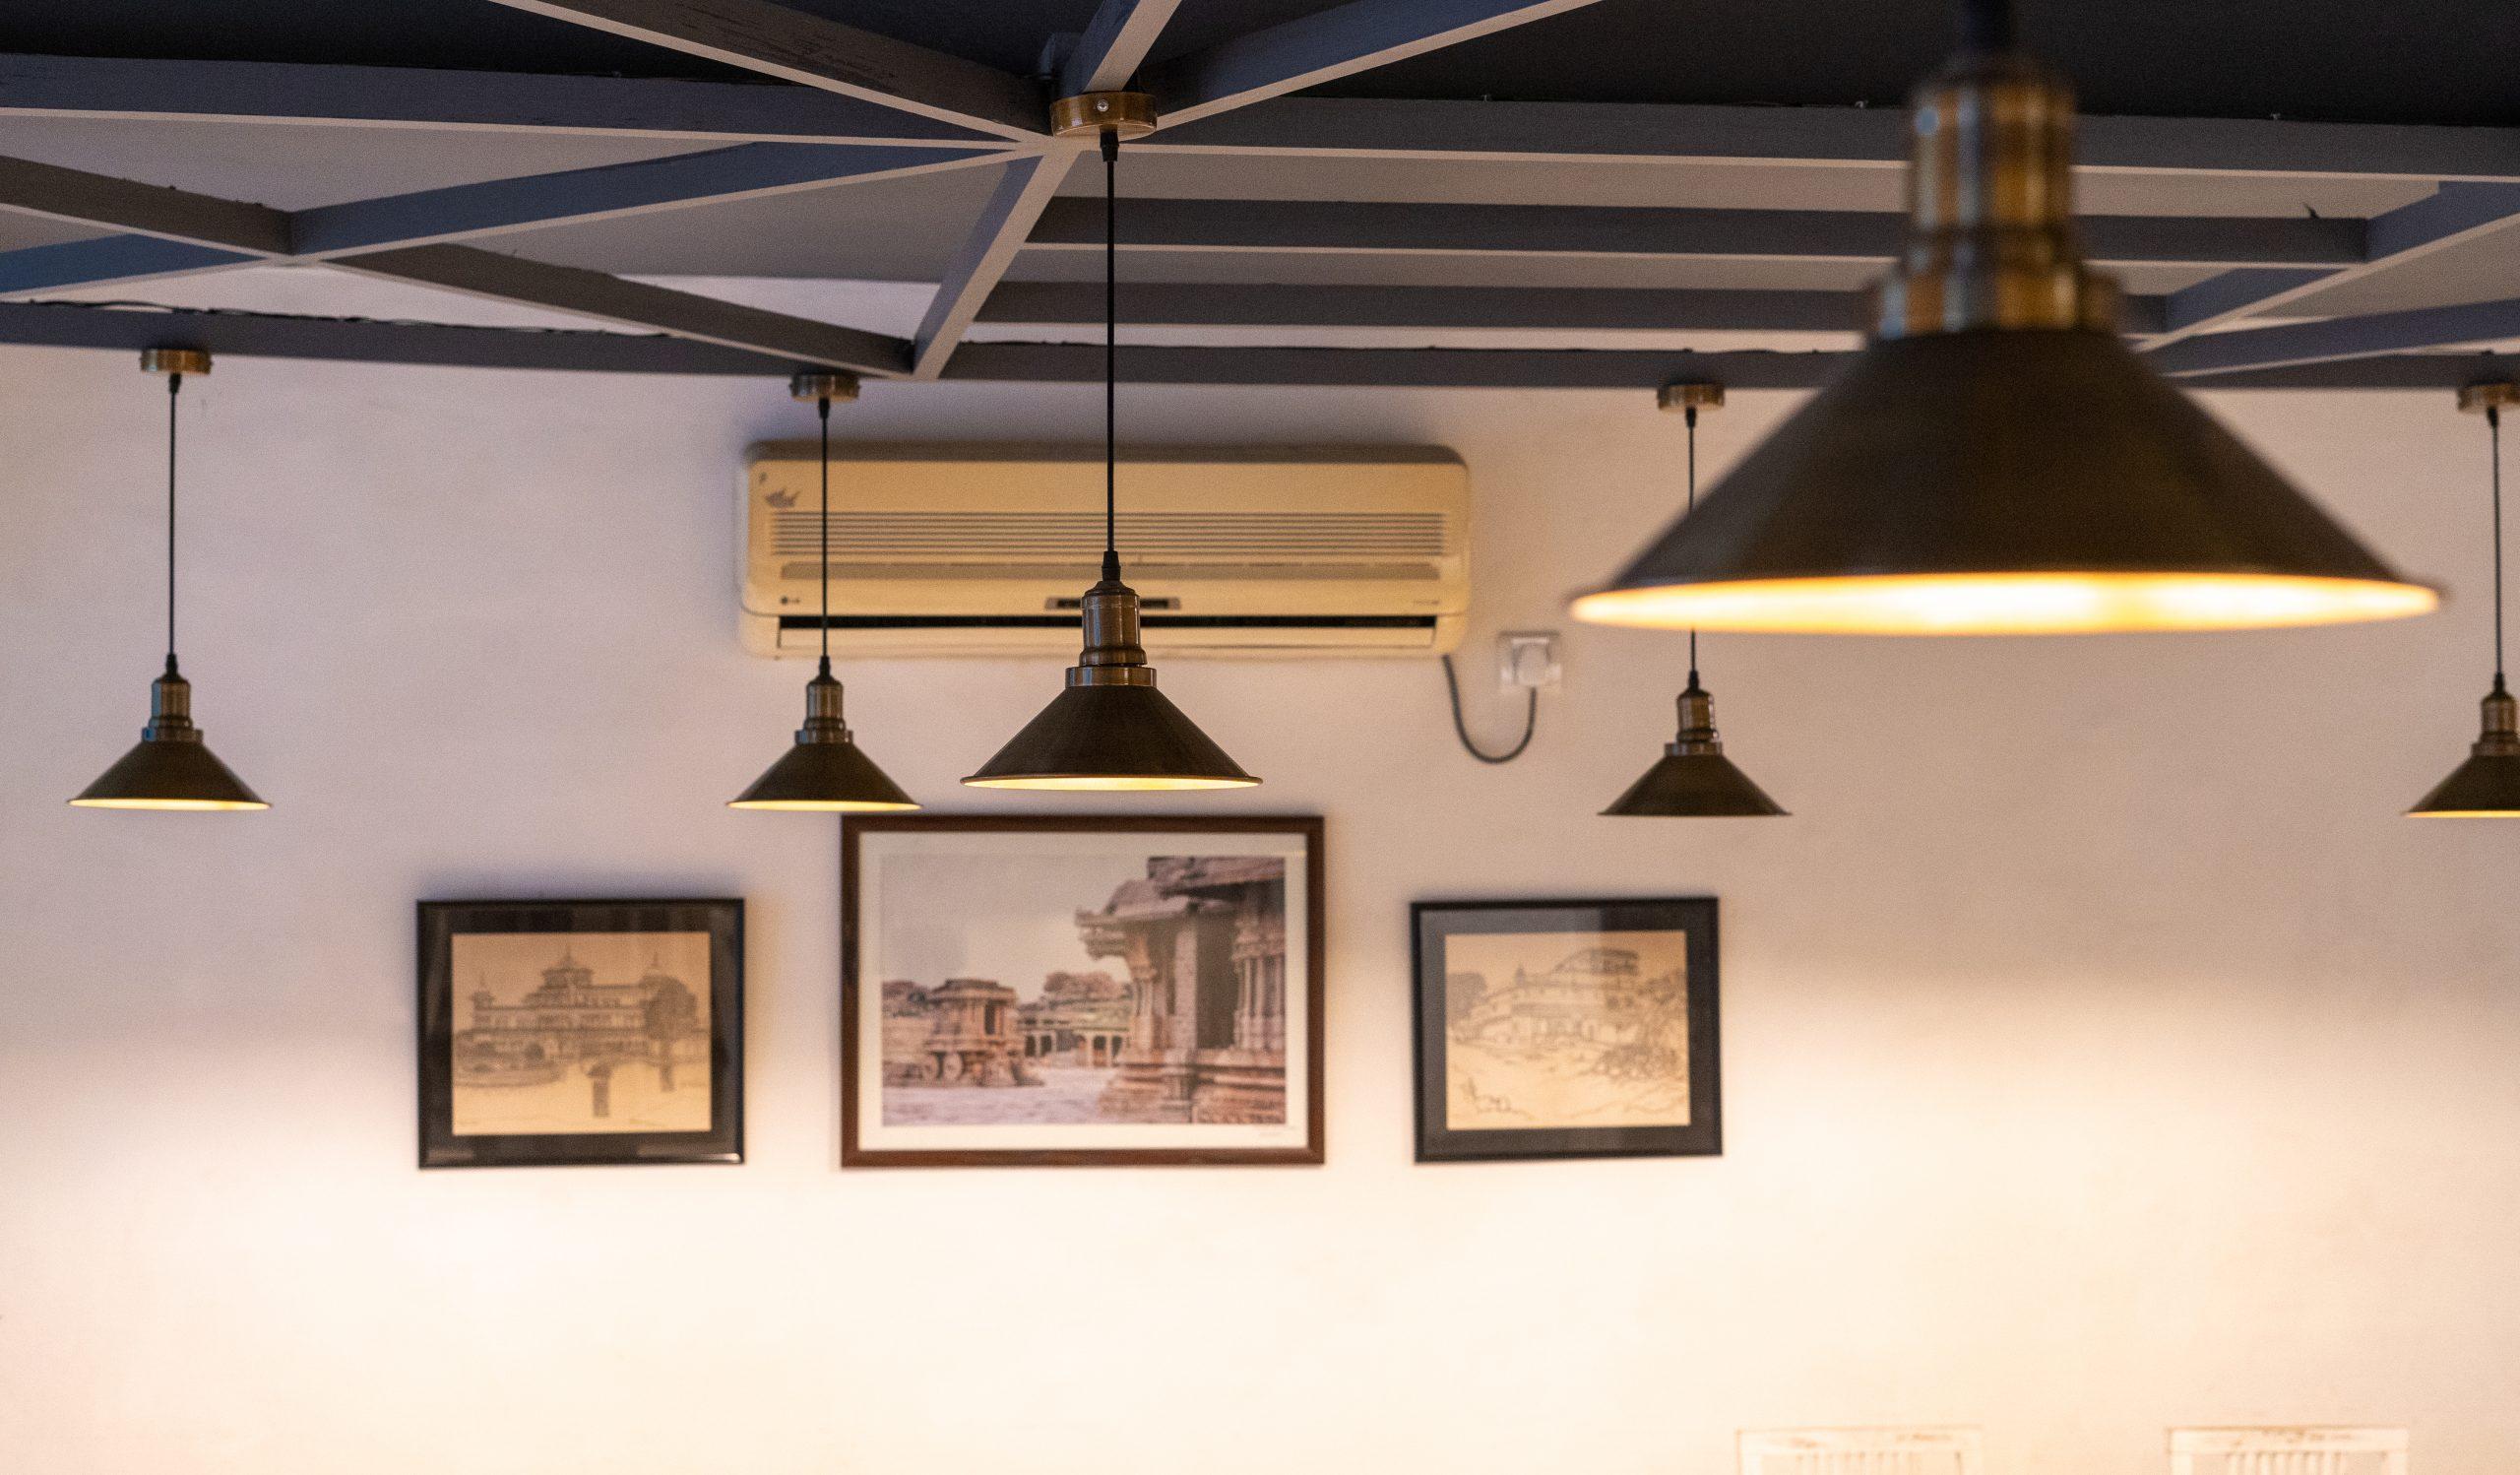 Cafe roof